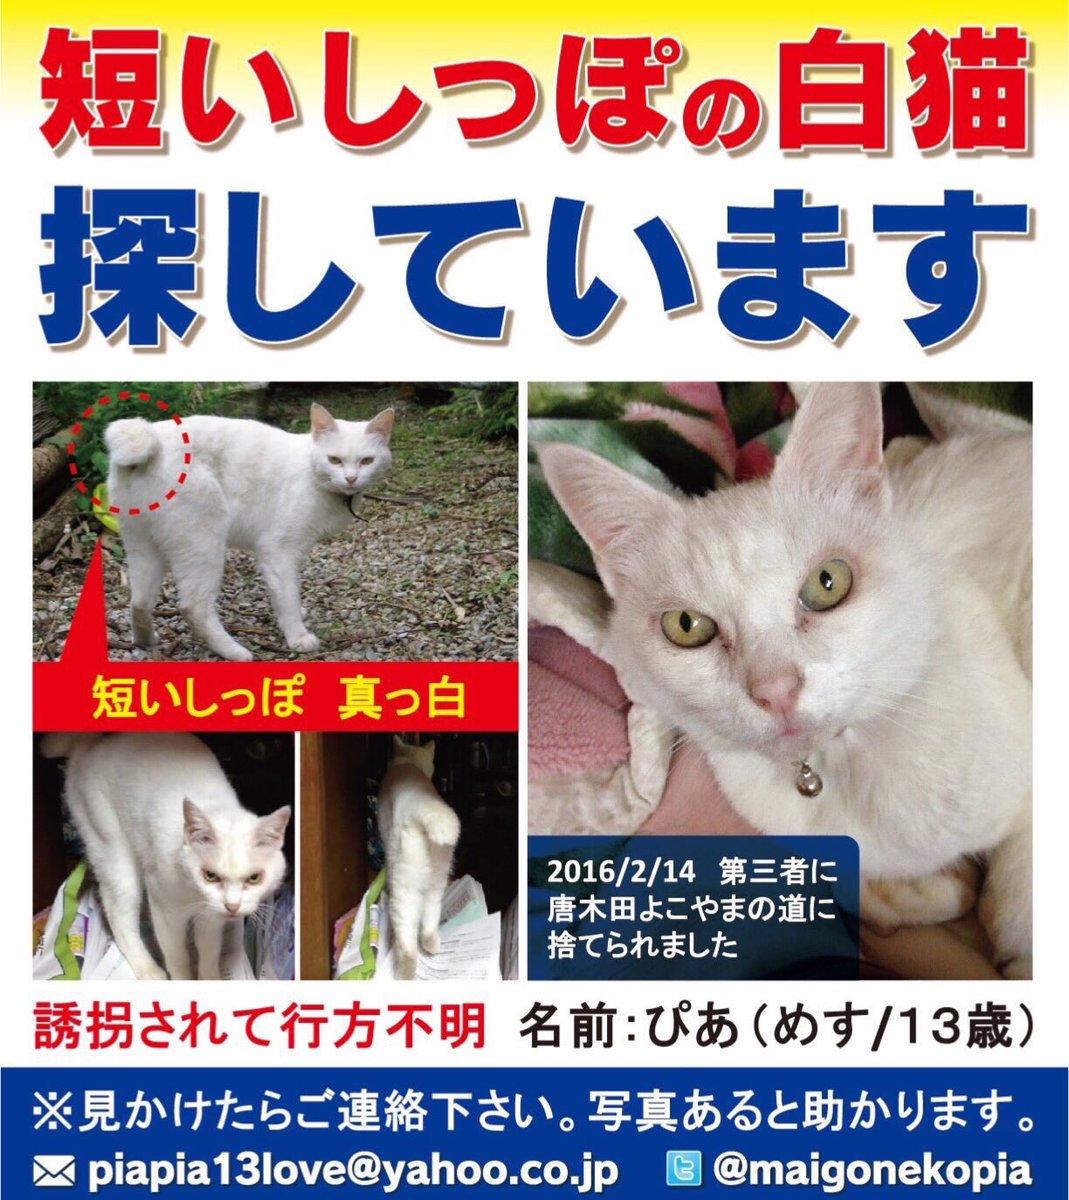 RT@maigonekopia  #拡散希望 近所の住民に自宅から4km離れた場所に遺棄された愛猫を探してます。  八王子市別所周辺で「人なつこい、若くない、尻尾短い、真っ白、目が黄緑色」の猫が目撃され本猫の可能性高いです。餌をあげてる、保護している人がいたらご連絡下さい https://t.co/6kAvCVpbkY